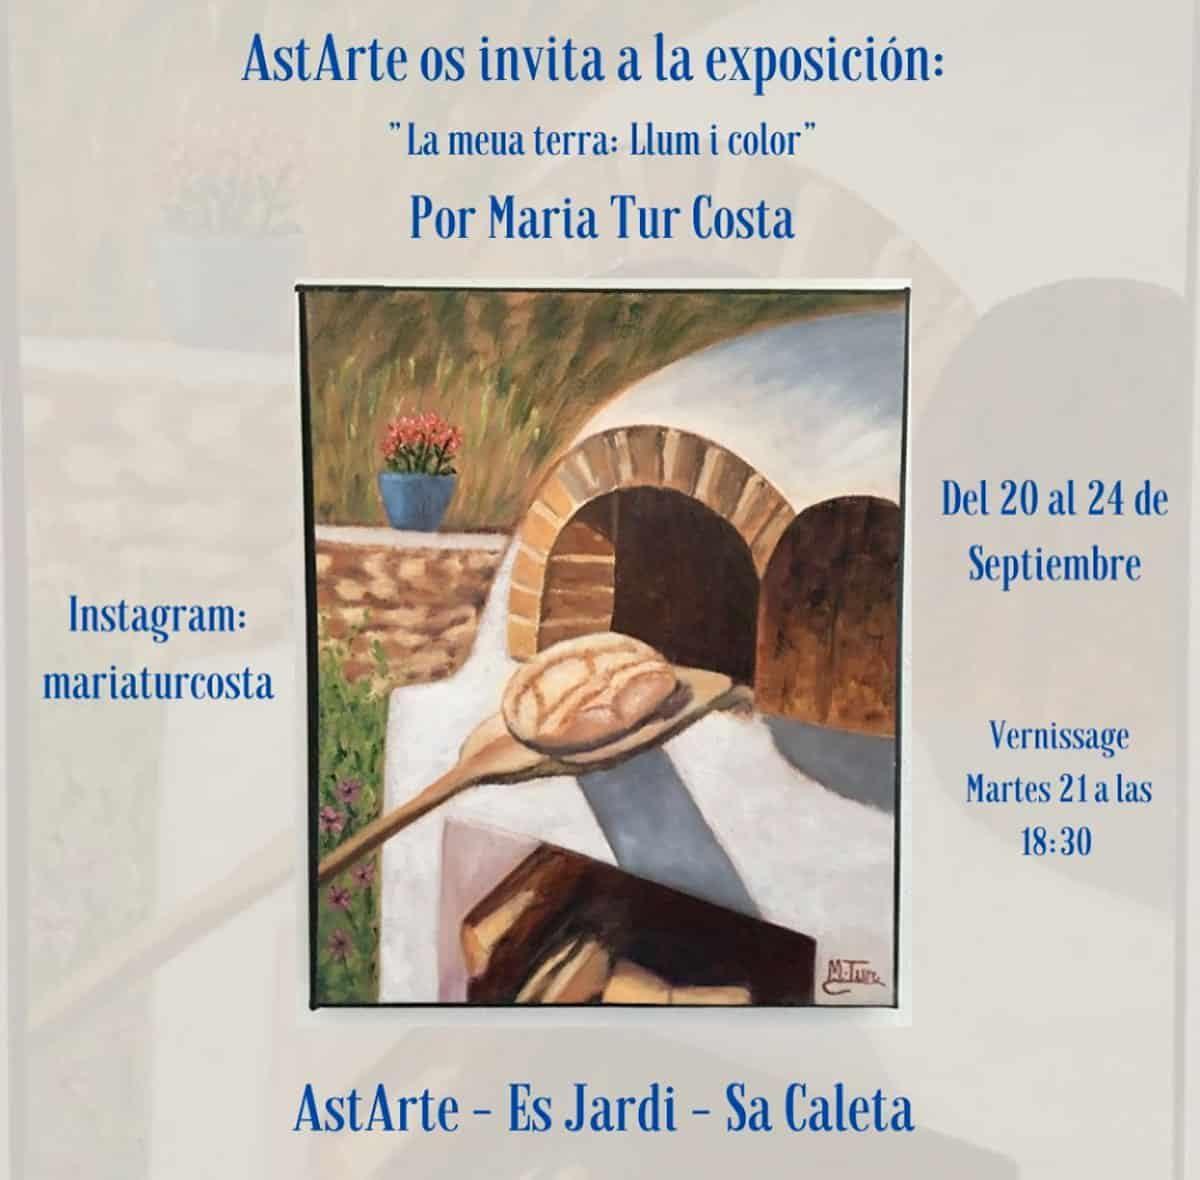 tentoonstelling-maria-tur-costa-astarte-ibiza-2021-welcometoibiza